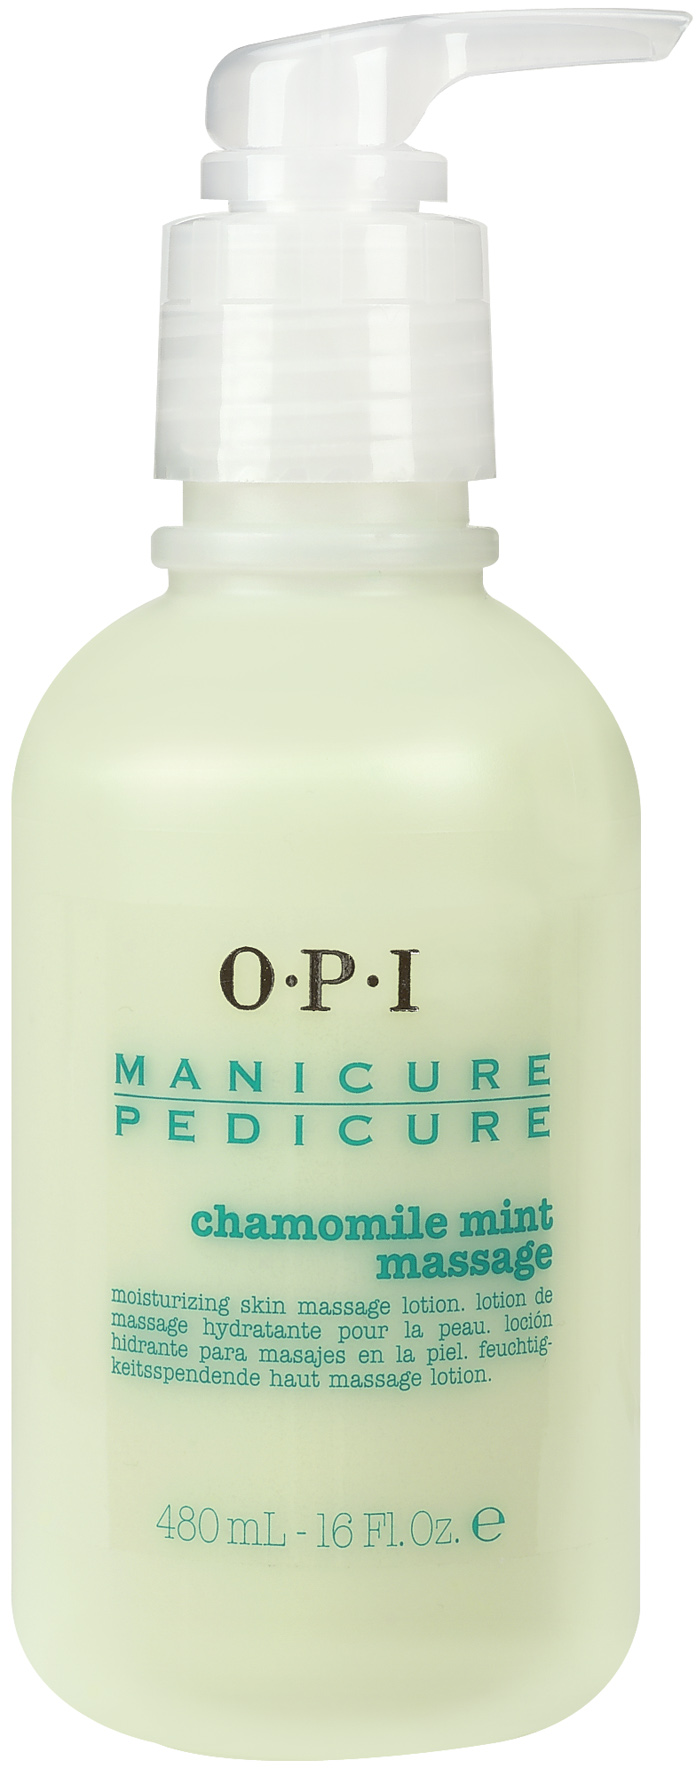 "OPI Лосьон массажный ""Ромашка-мята"" / Manicure-Pedicure Chamomile Mint Lotion 480мл"